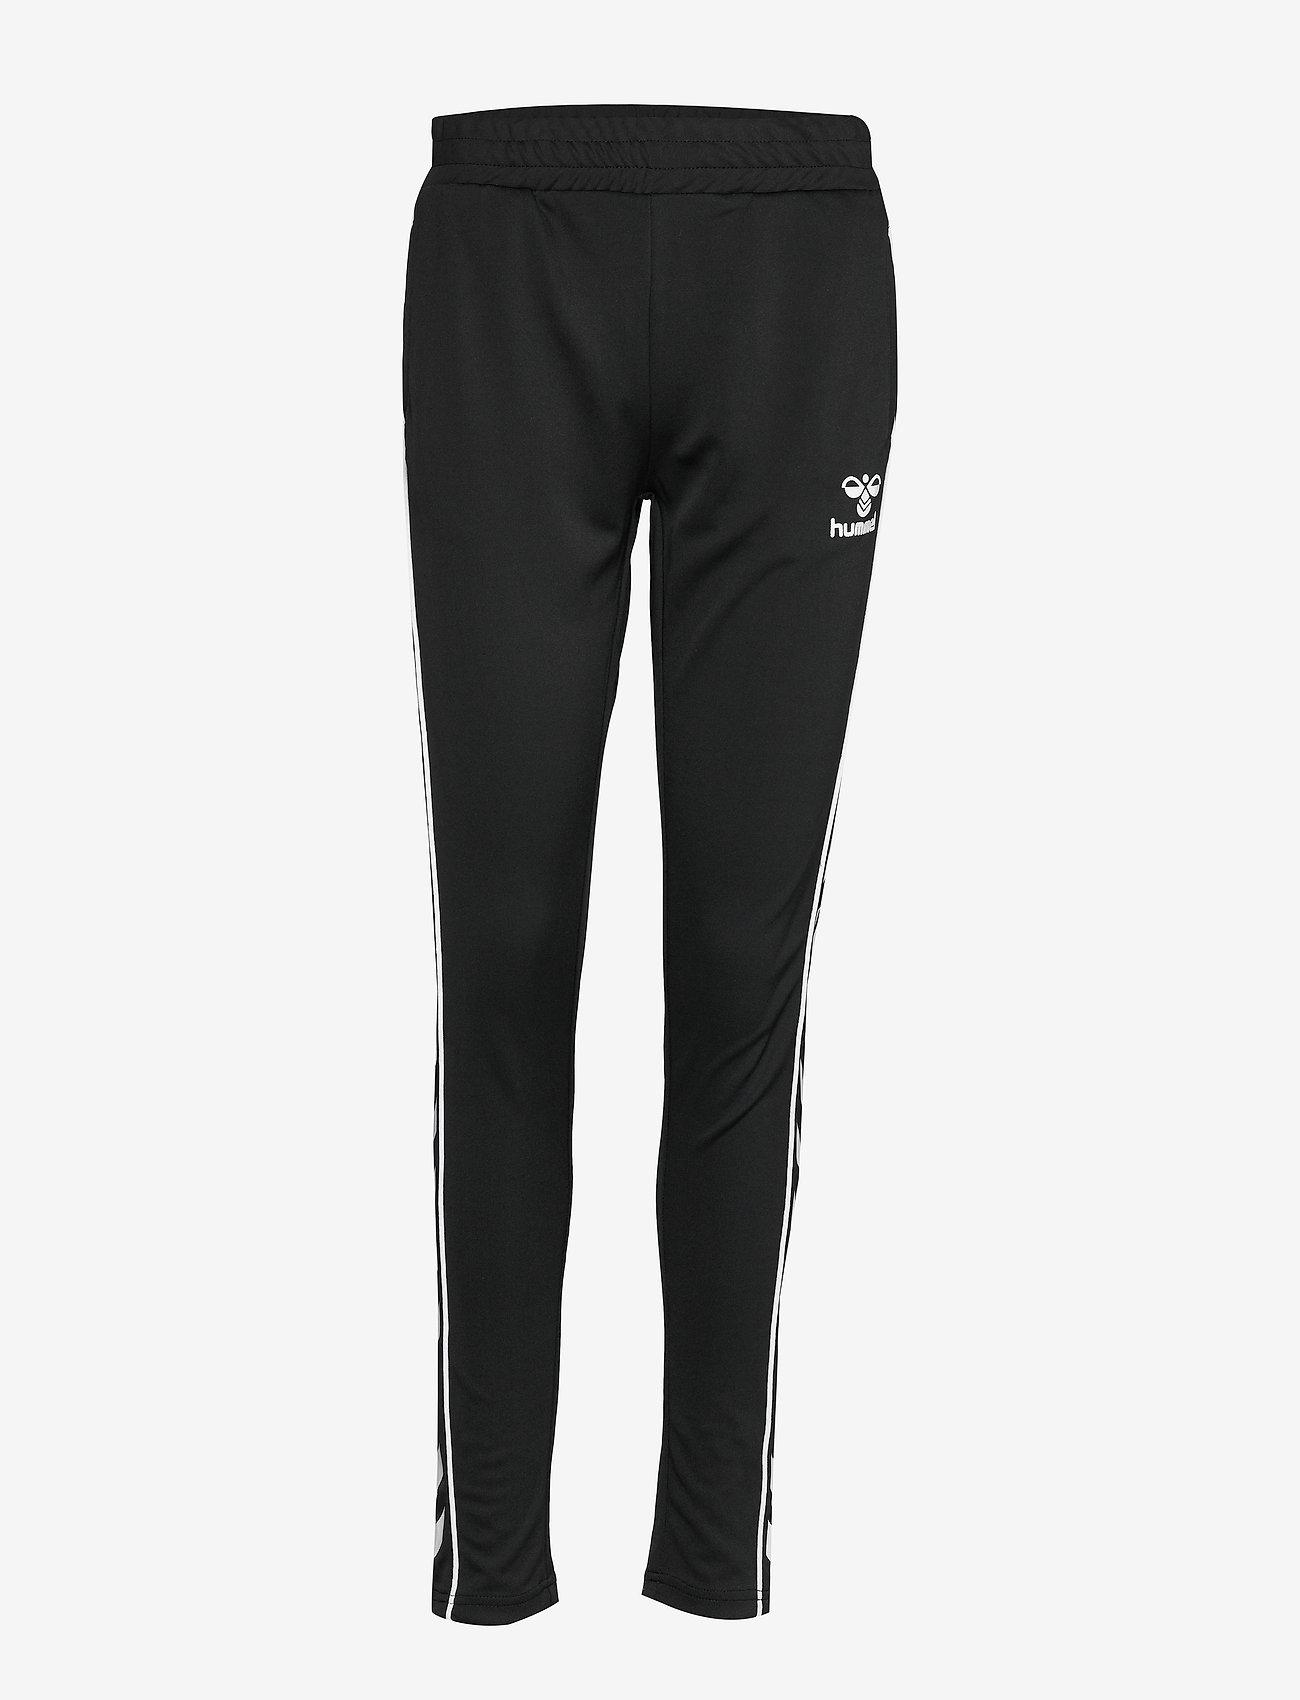 Hummel - hmlJINA SLIM PANTS - pants - black - 0